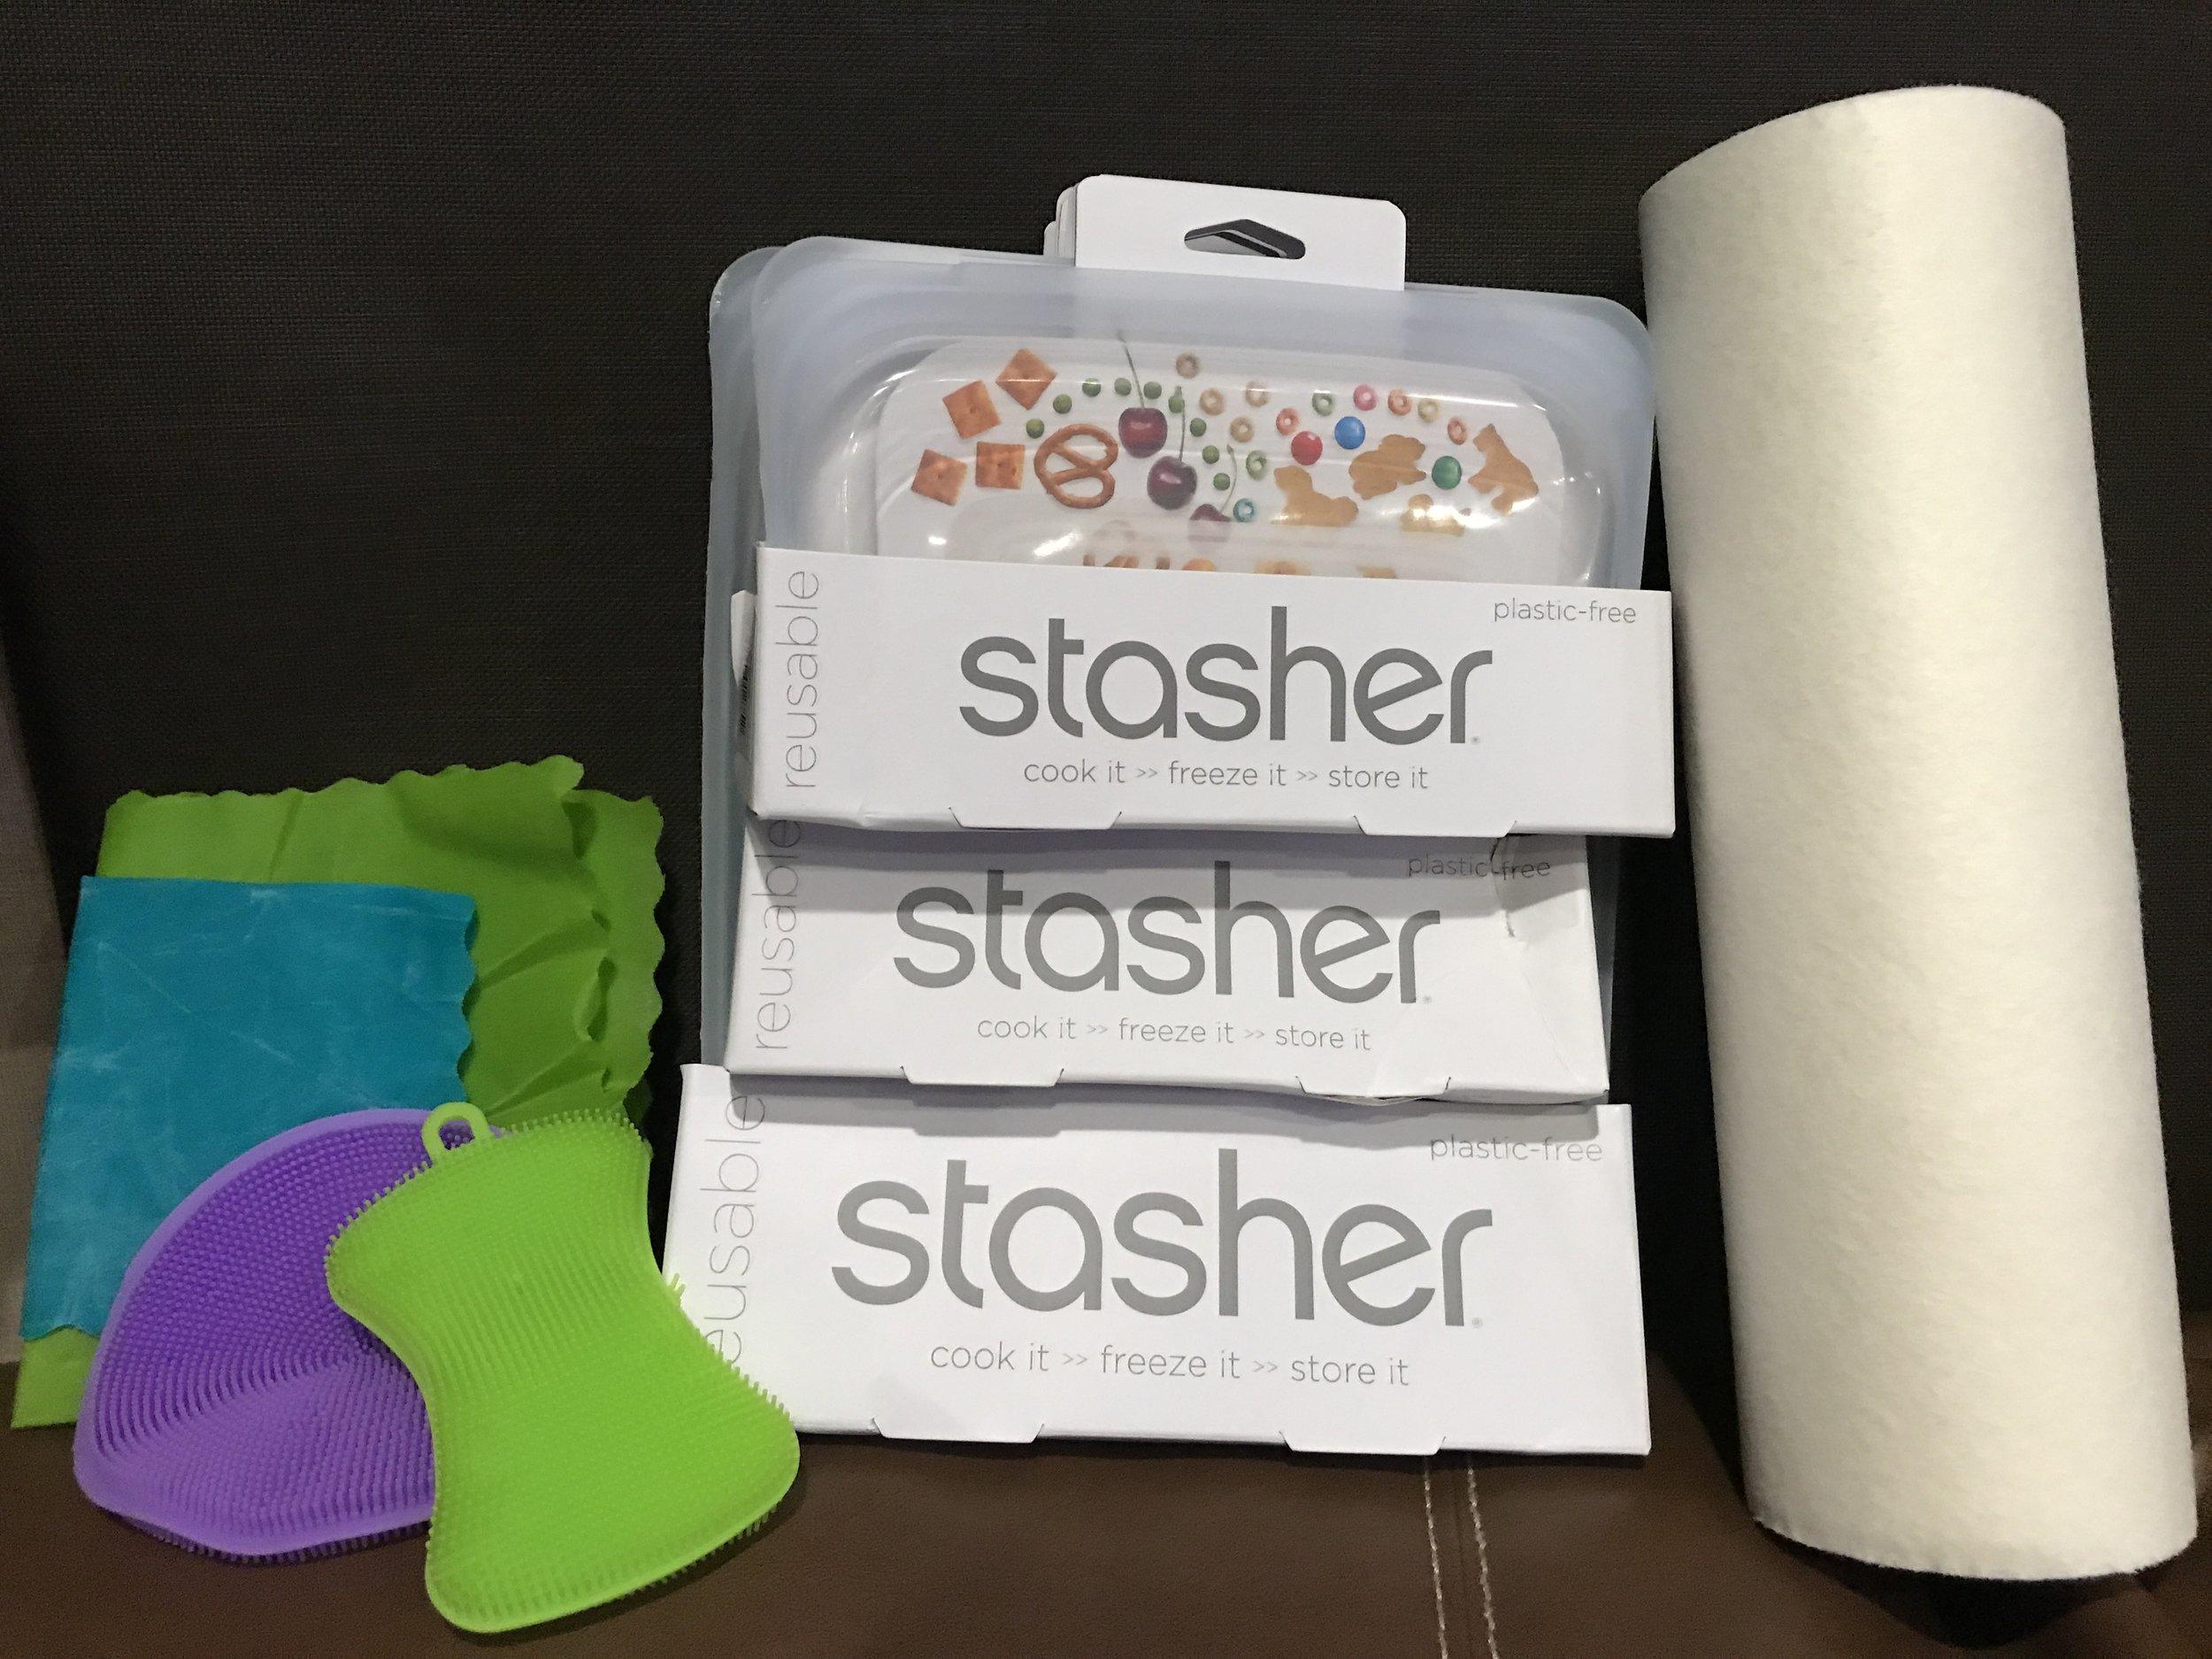 Beeswax food wrap, reusable silicone sponge, reusable silicone bags, reusable towels